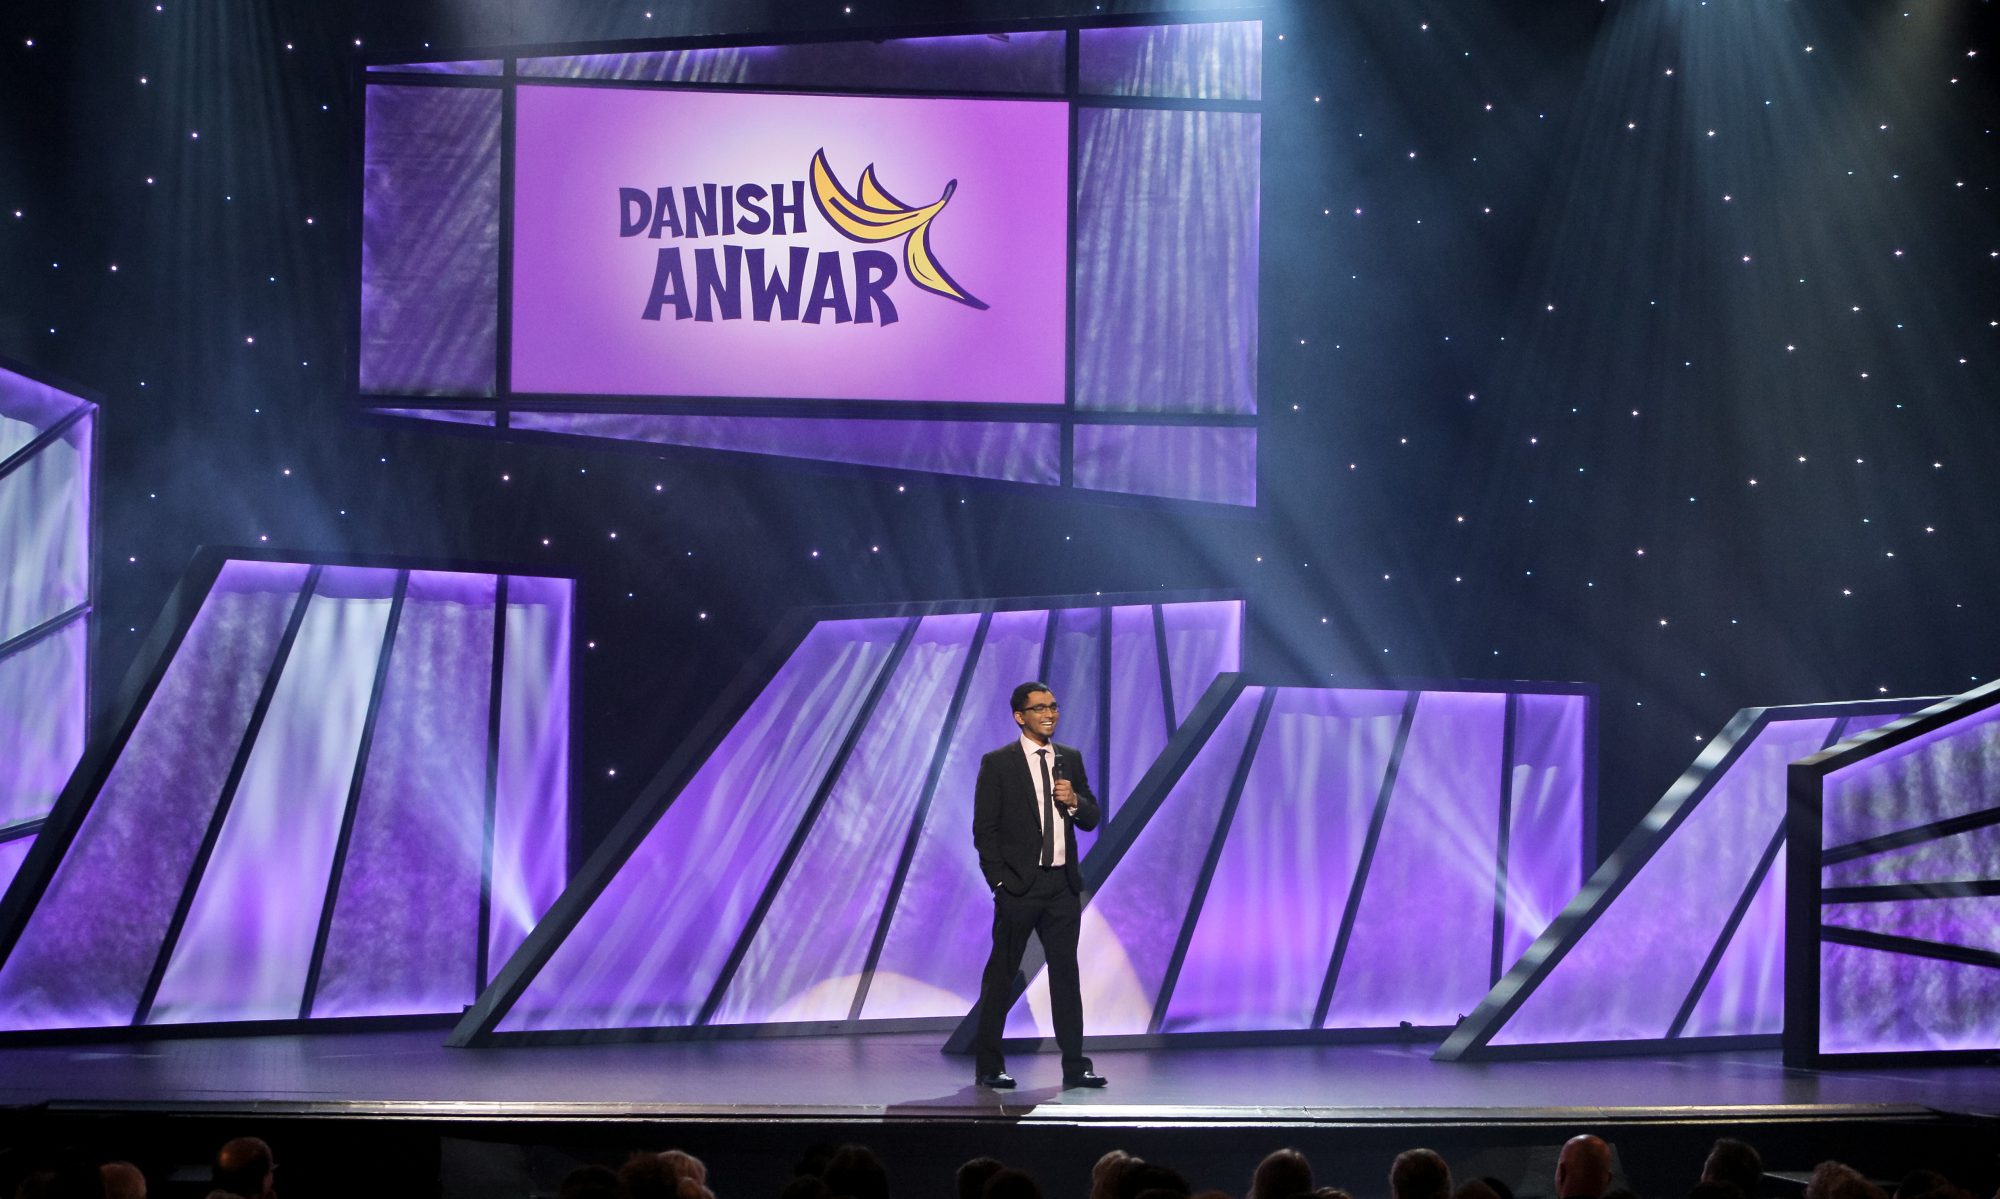 Danish Anwar